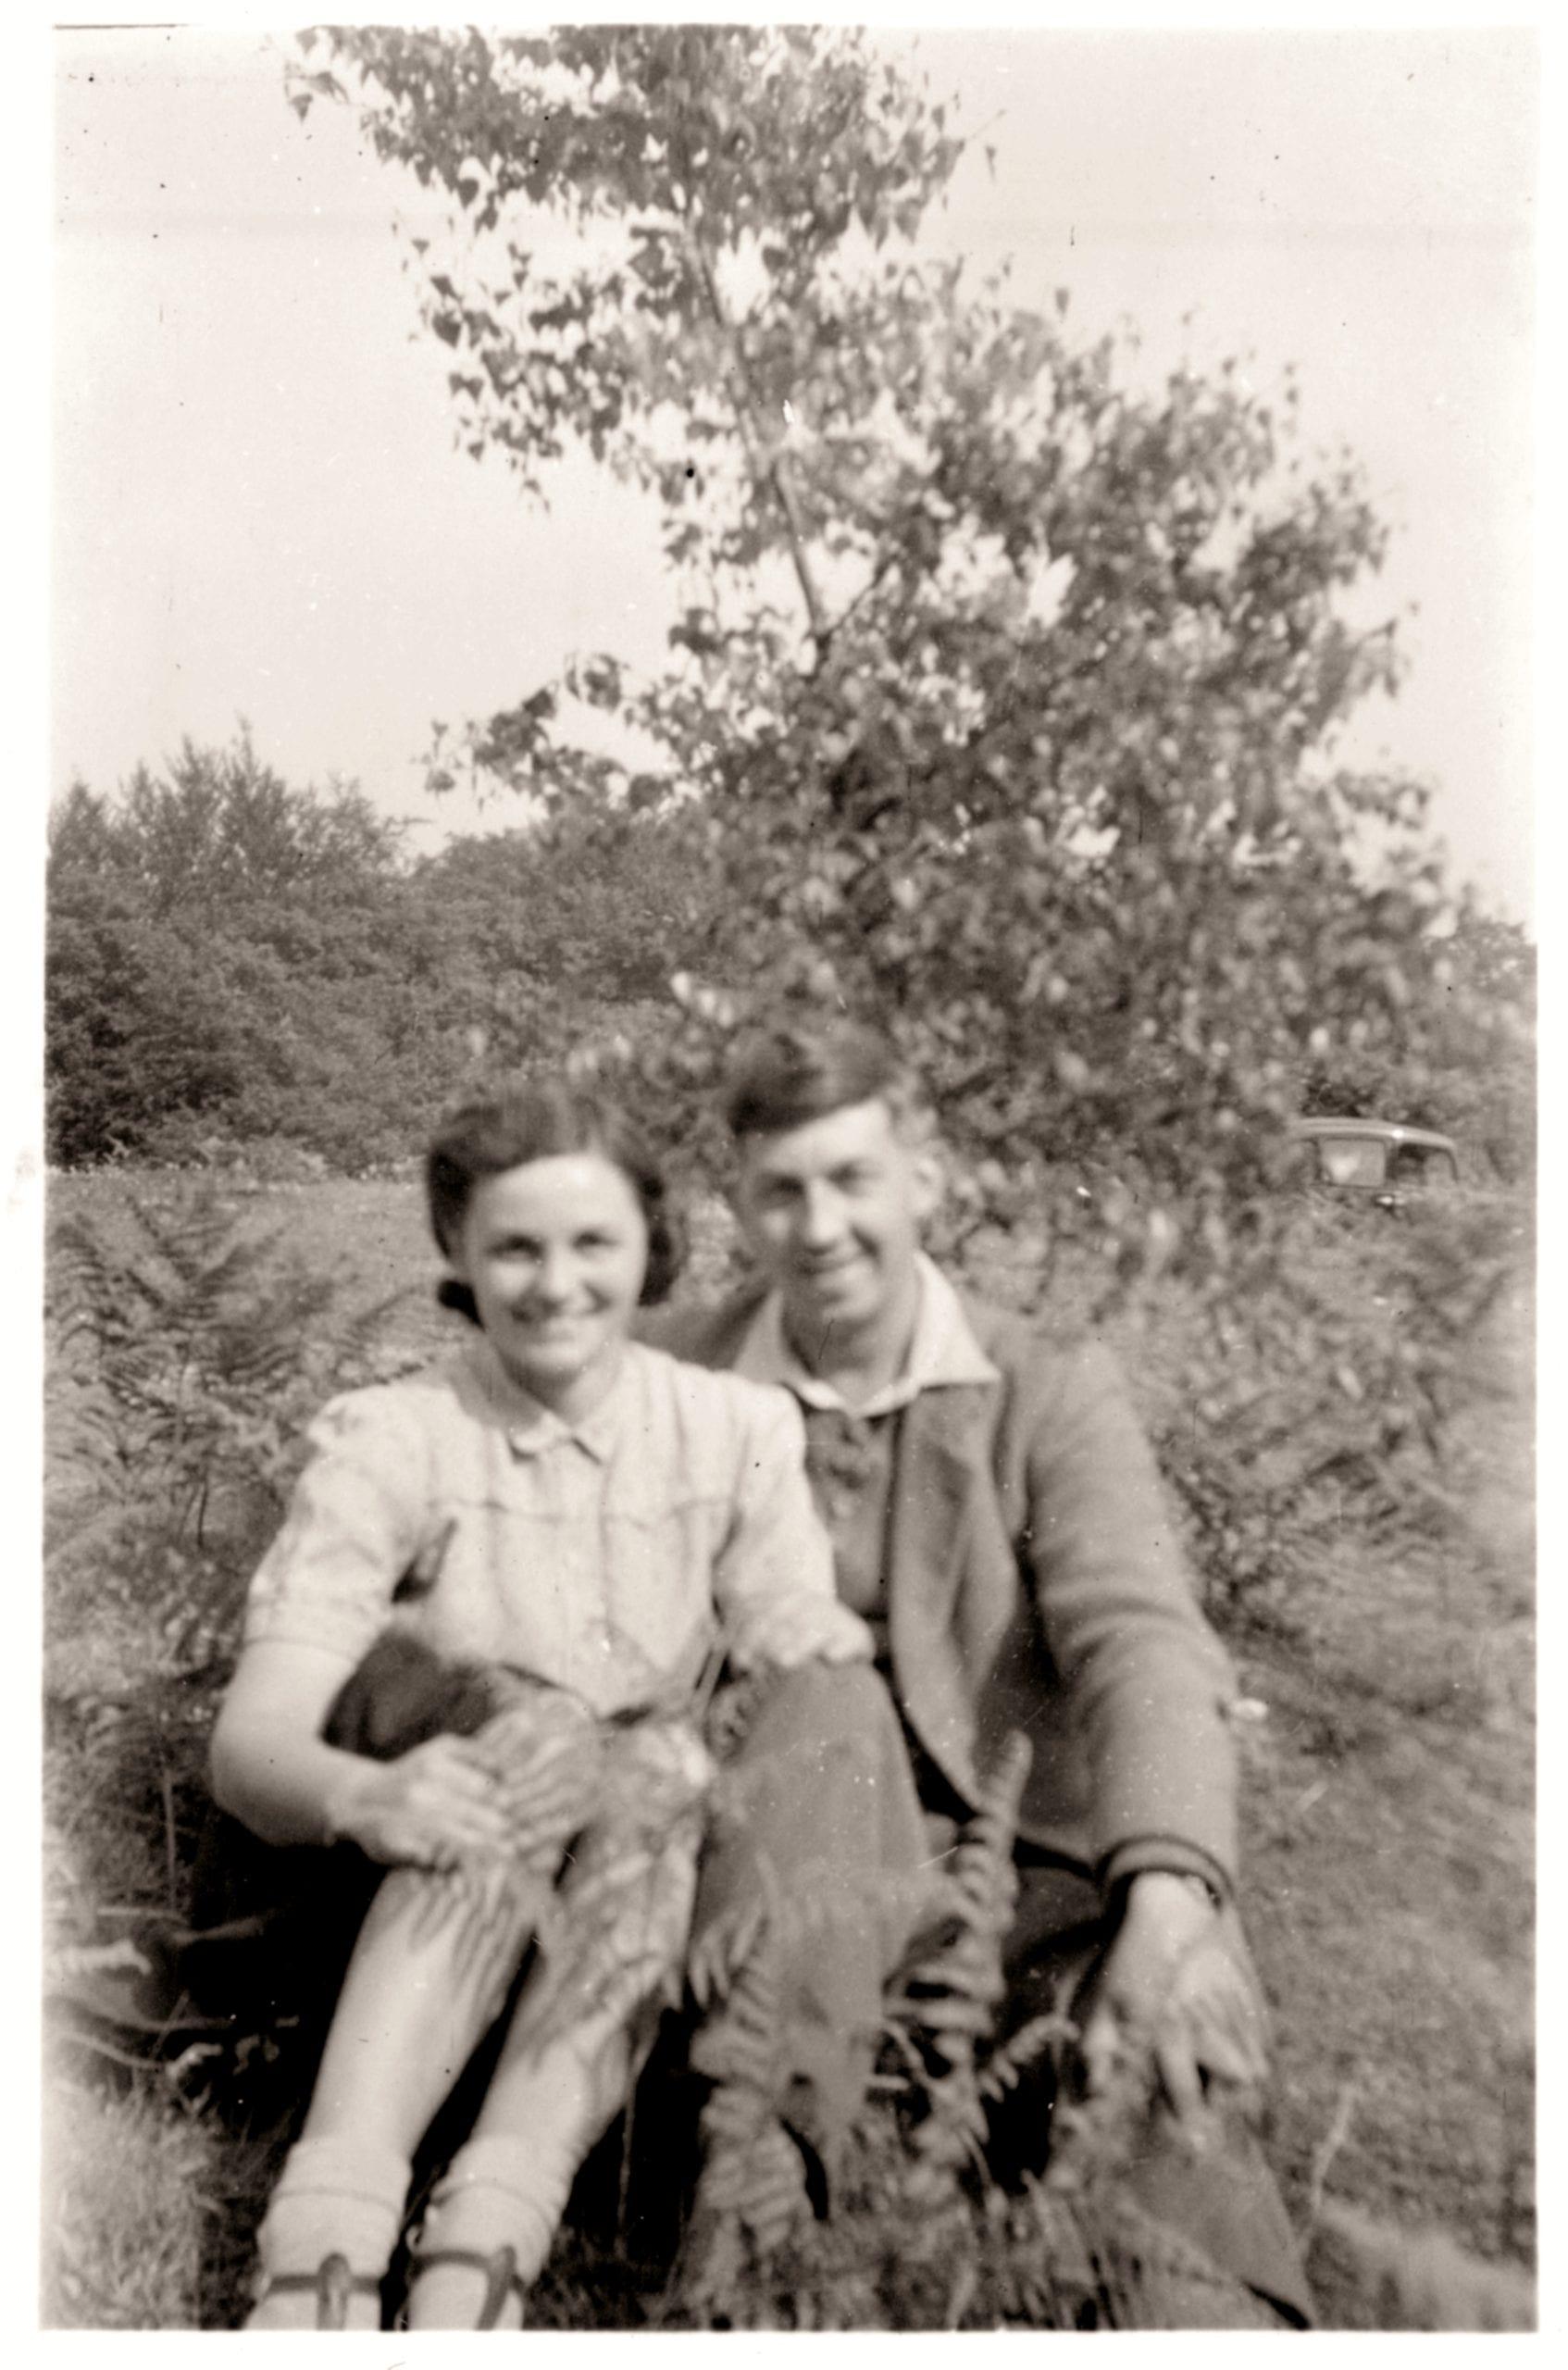 John and Olive Marrington